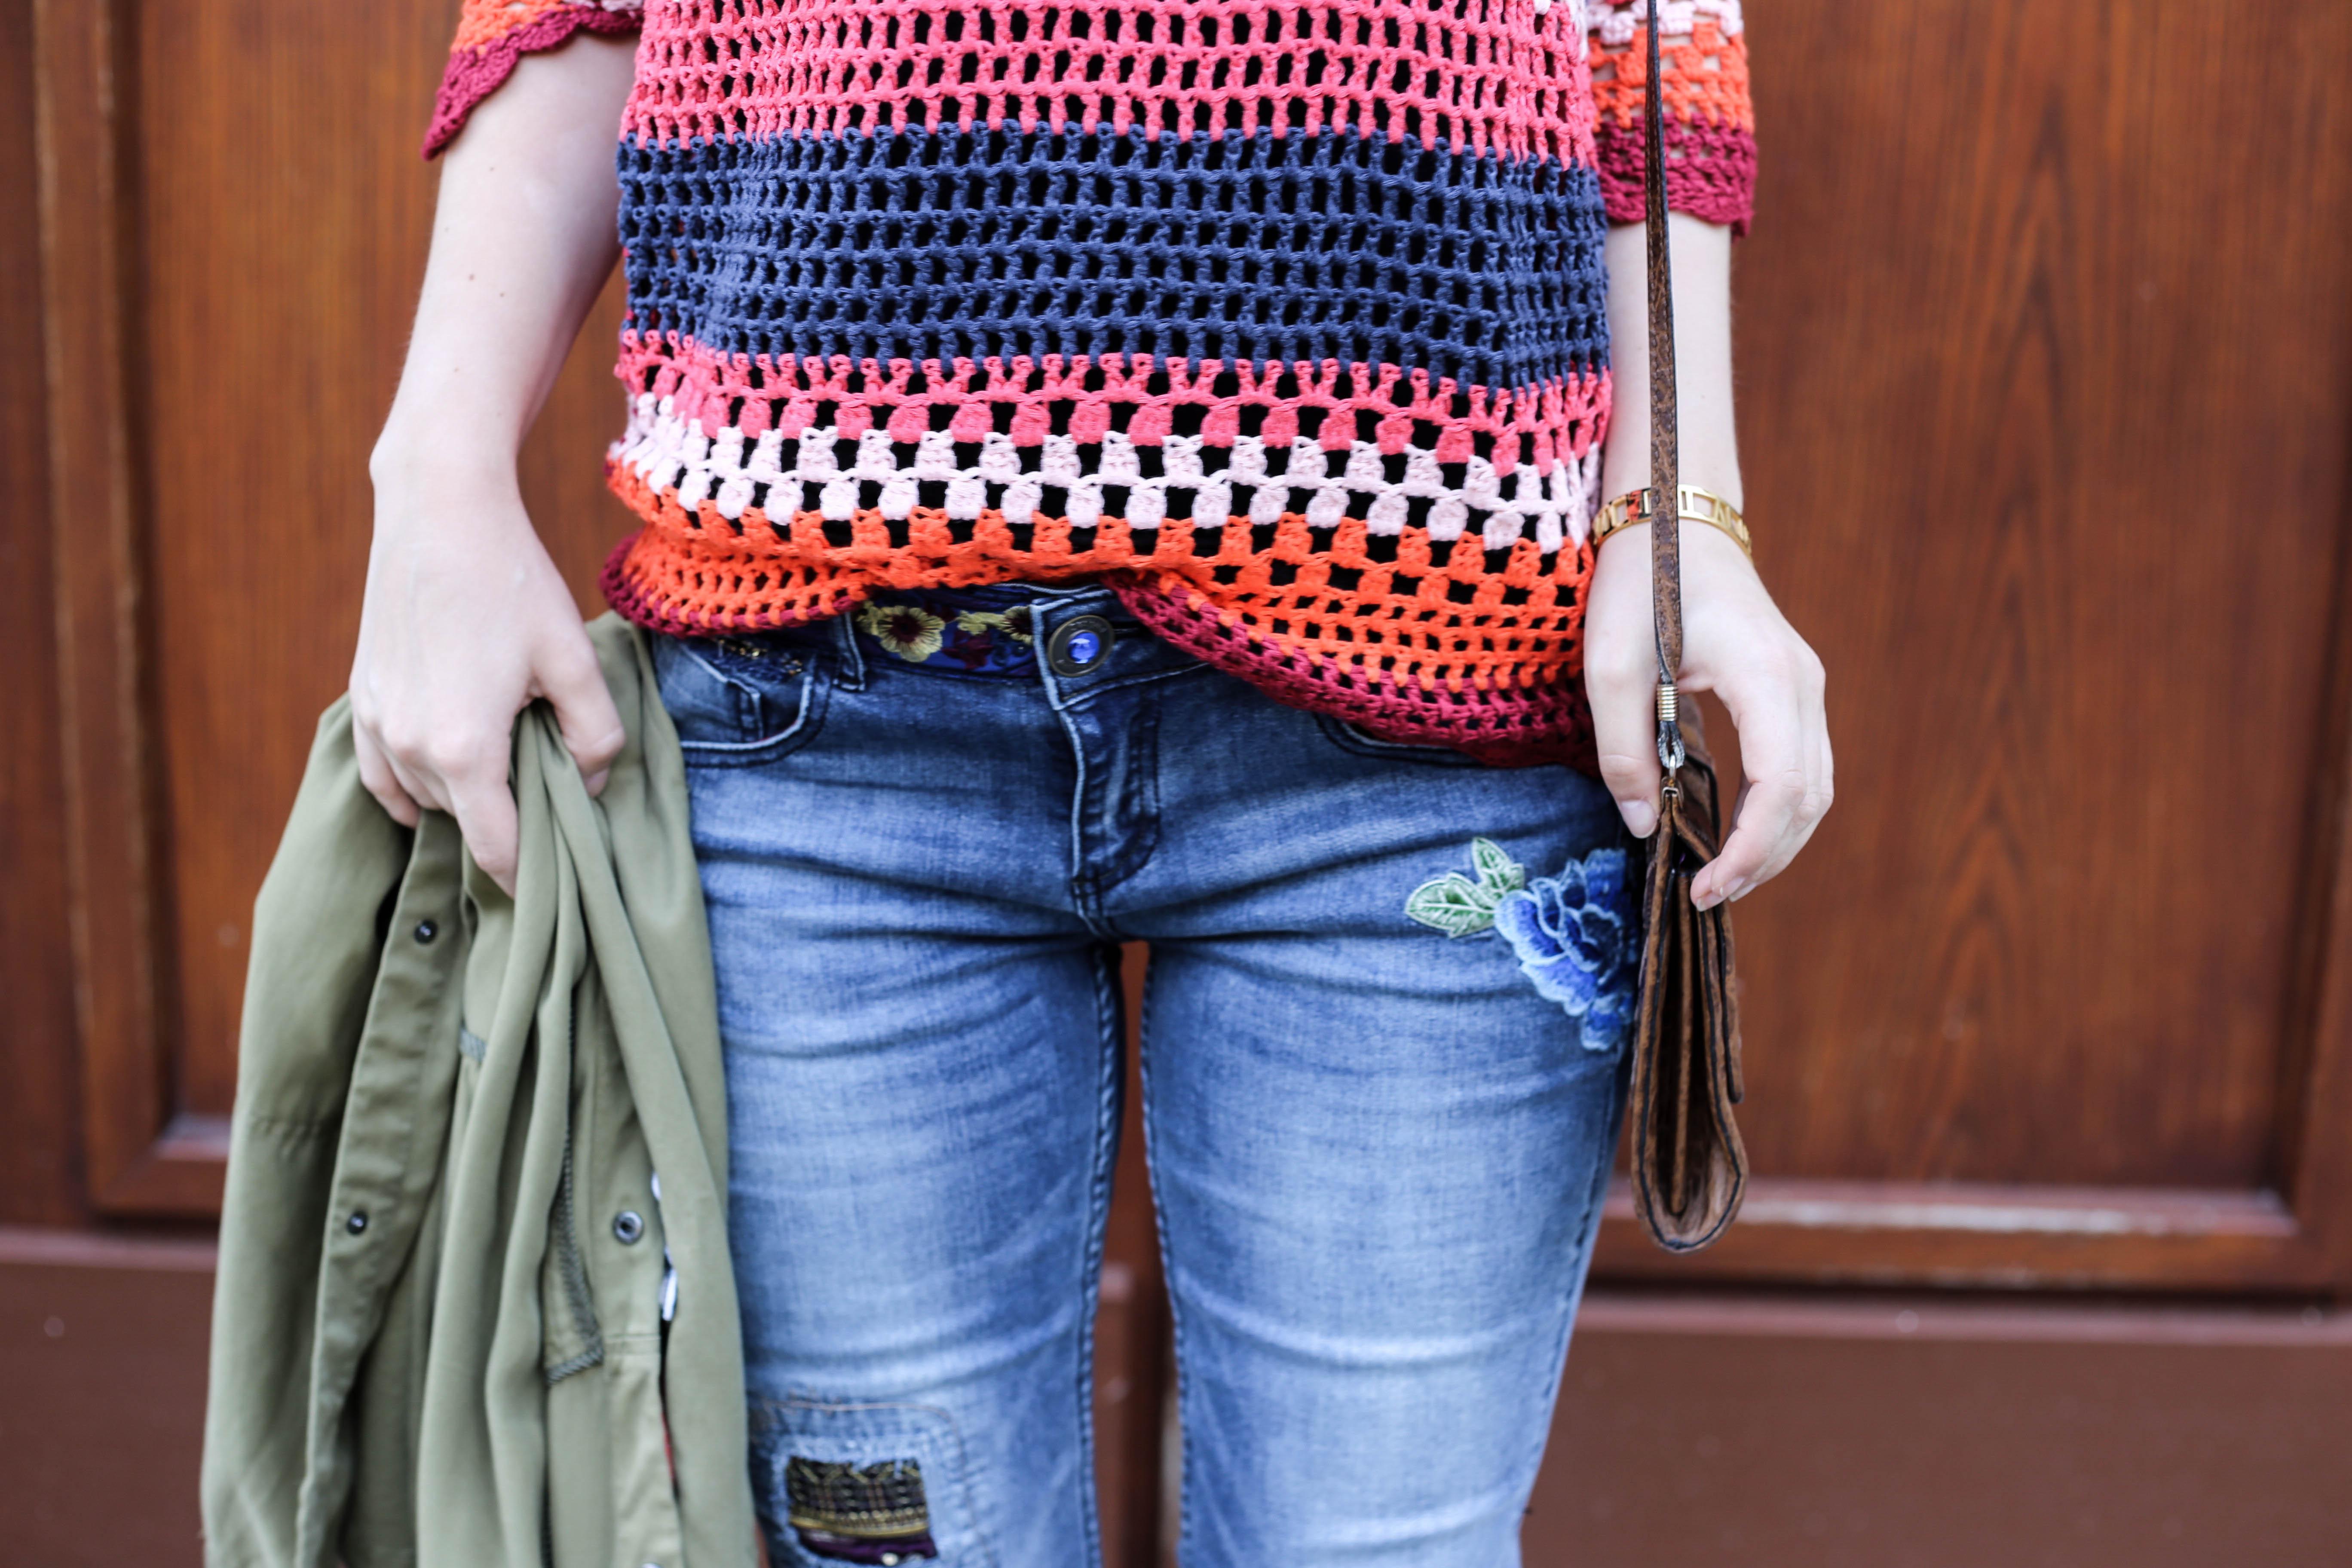 spaetsommer-look-desigual-bunt-alltag-fashionblog-modeblog-berlin_4008